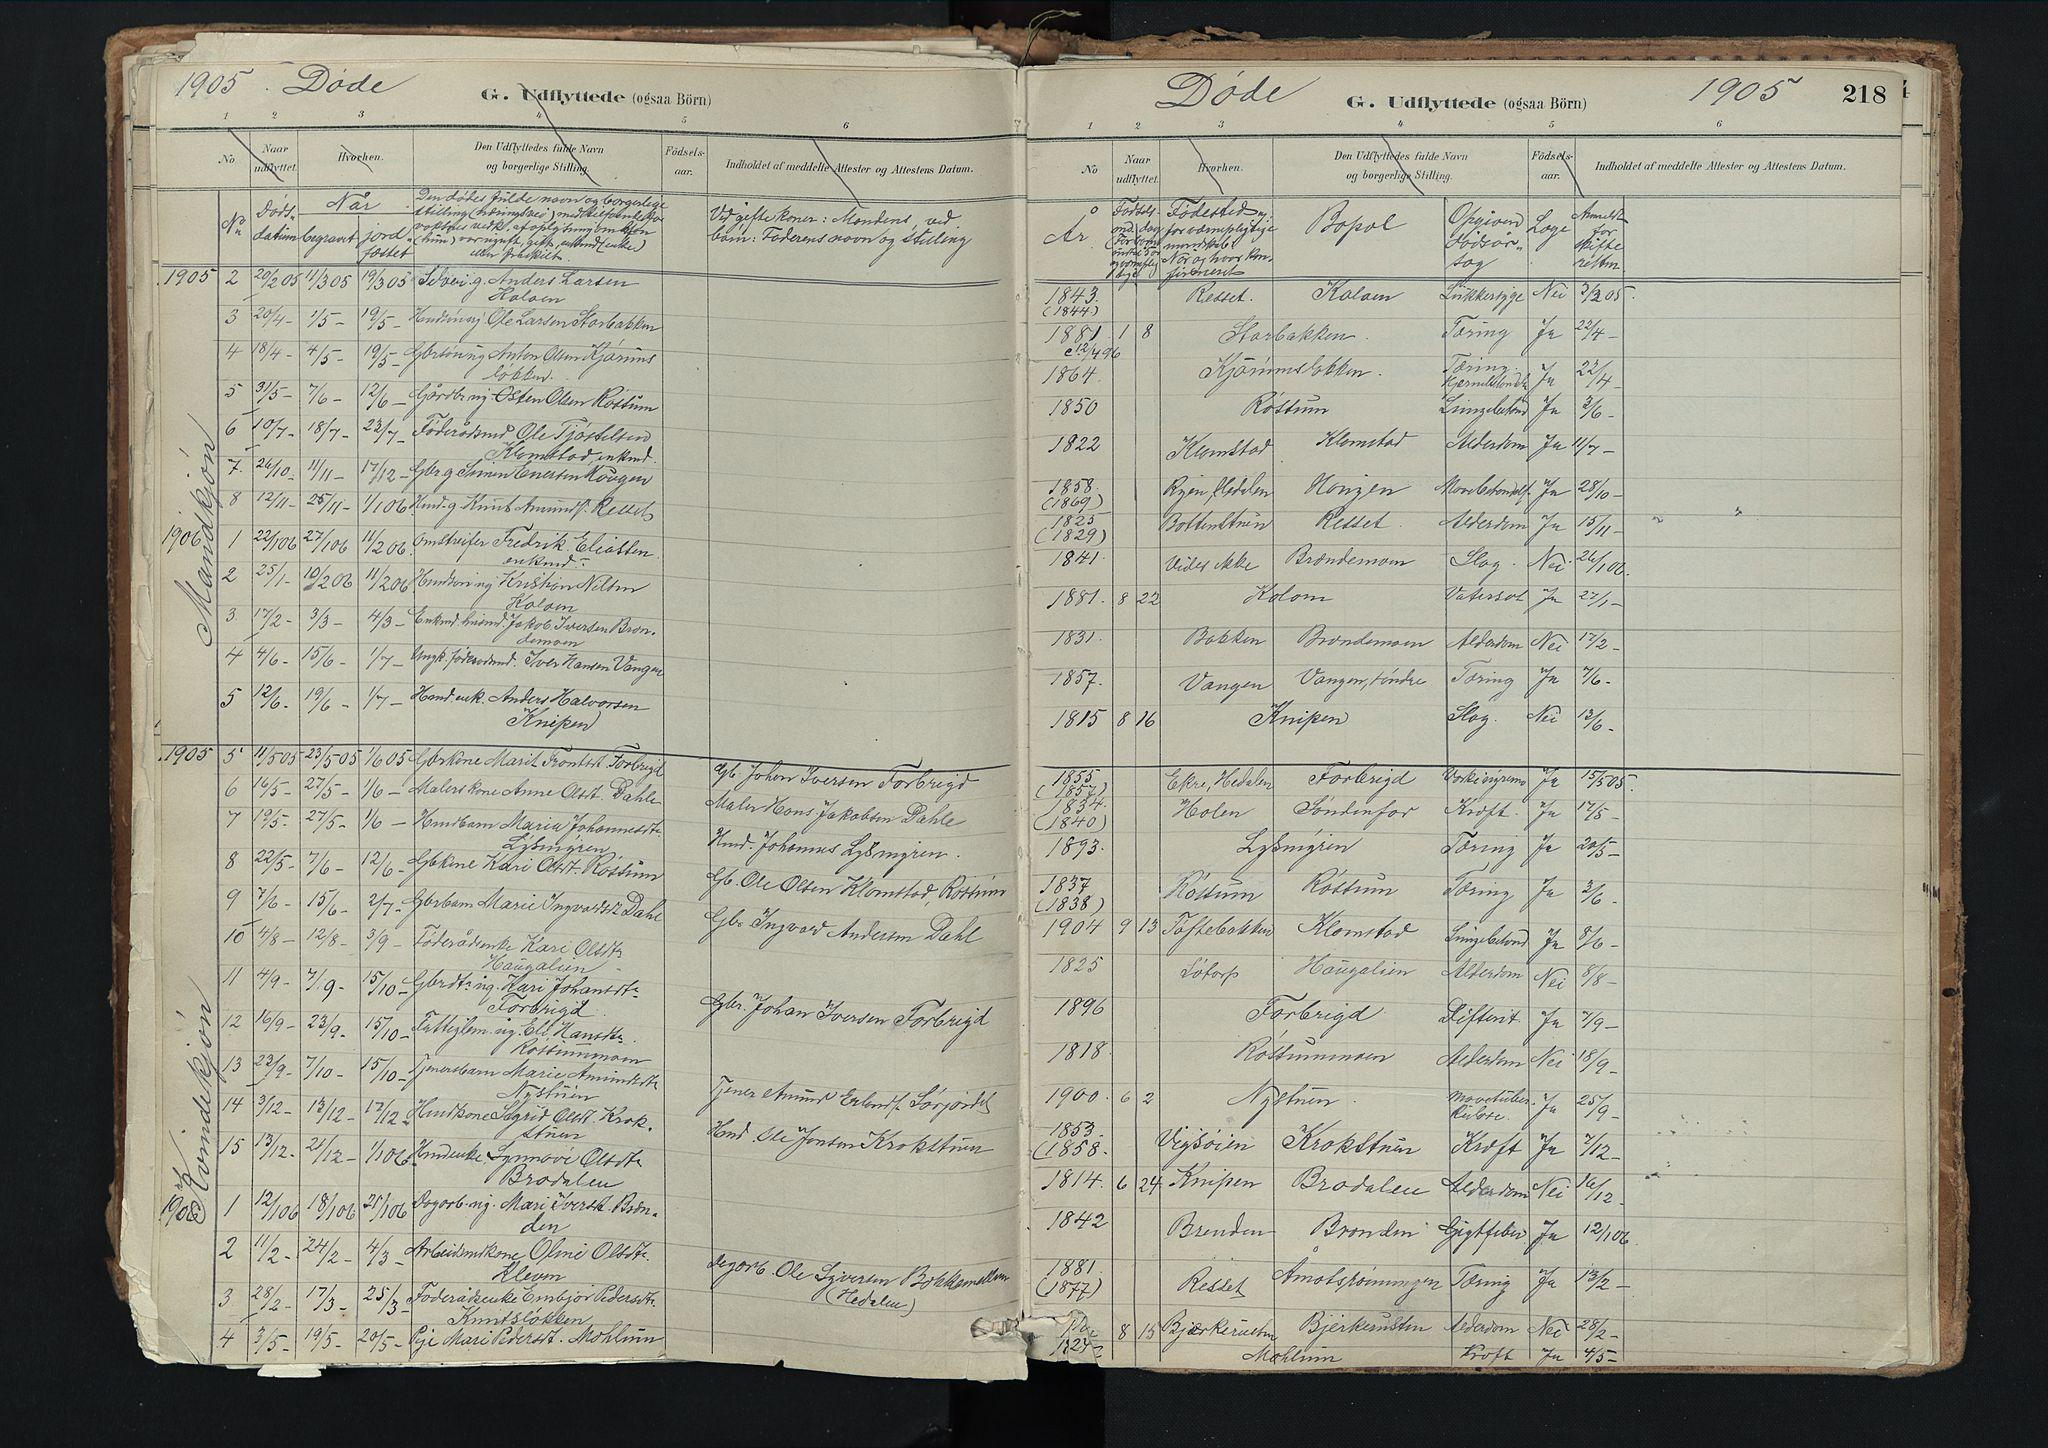 SAH, Nord-Fron prestekontor, Ministerialbok nr. 3, 1884-1914, s. 218